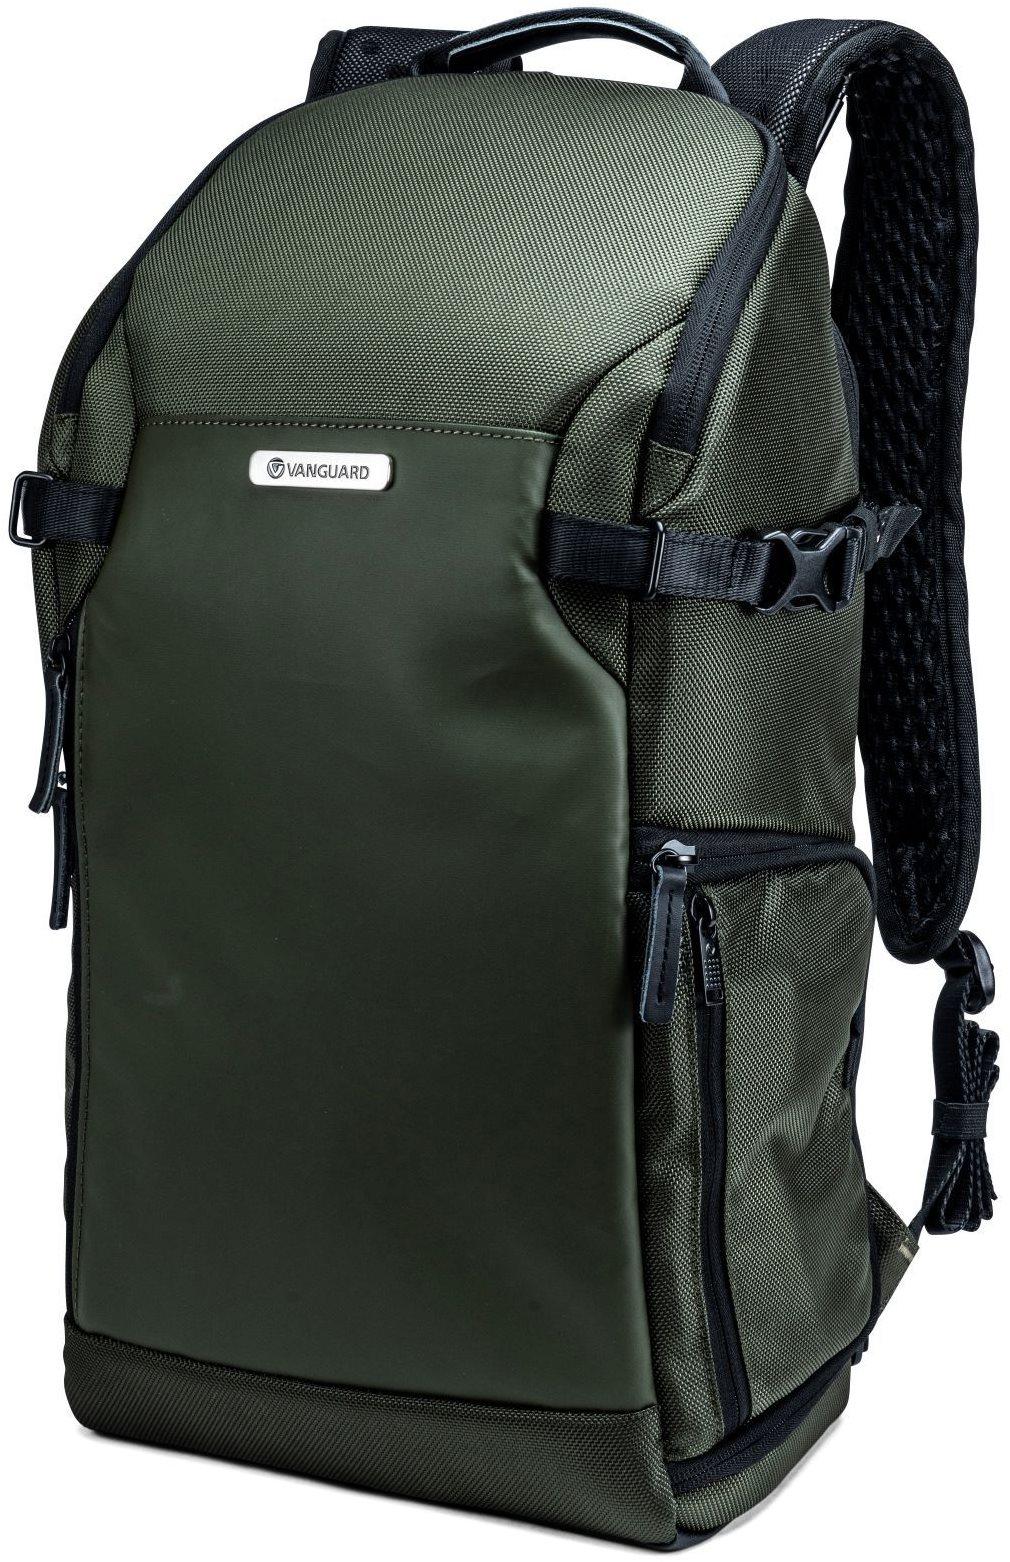 Vanguard VEO Select 46 BR GR zöld